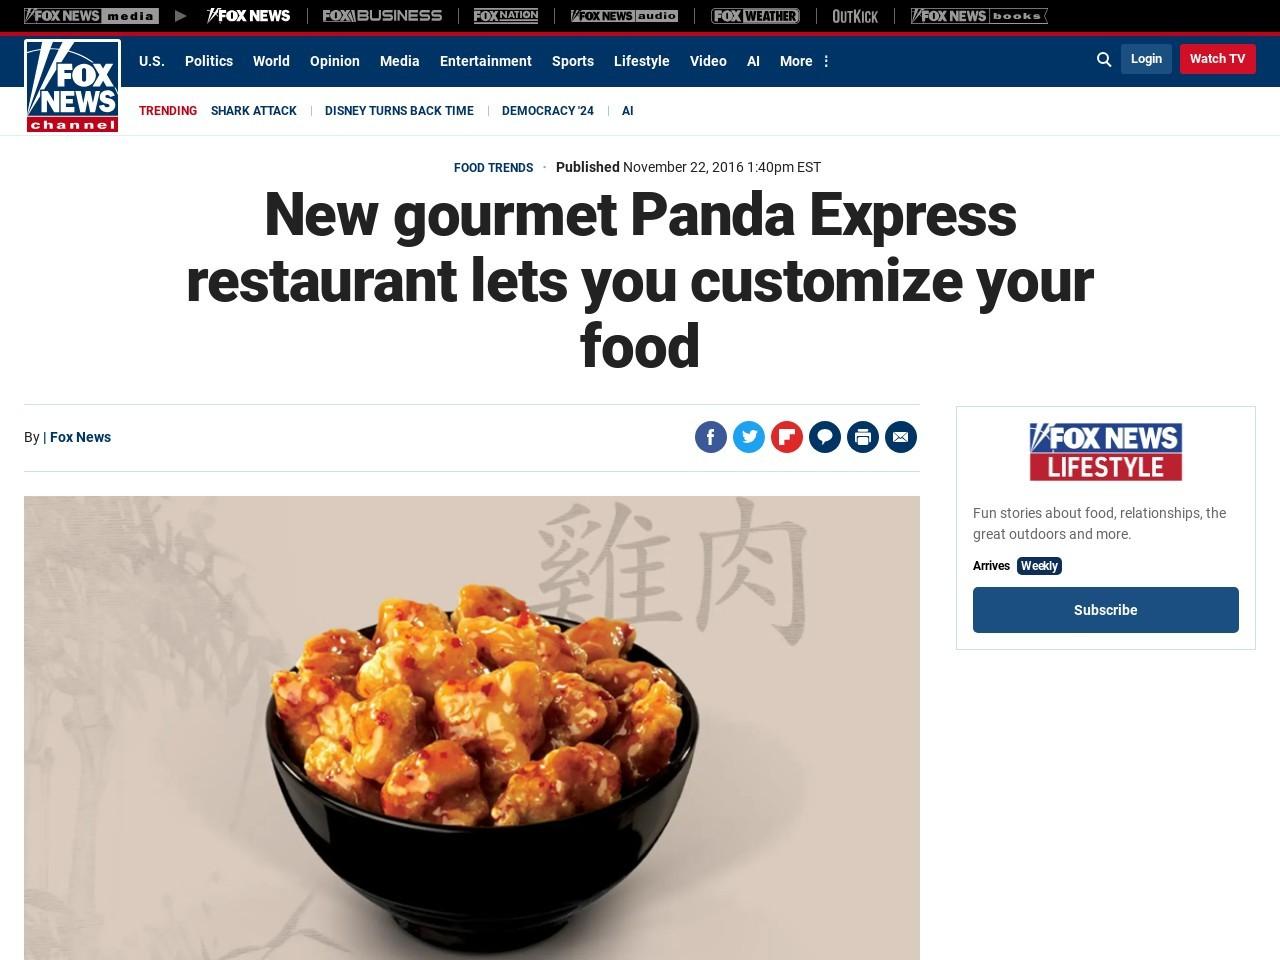 New gourmet Panda Express restaurant lets you customize your food